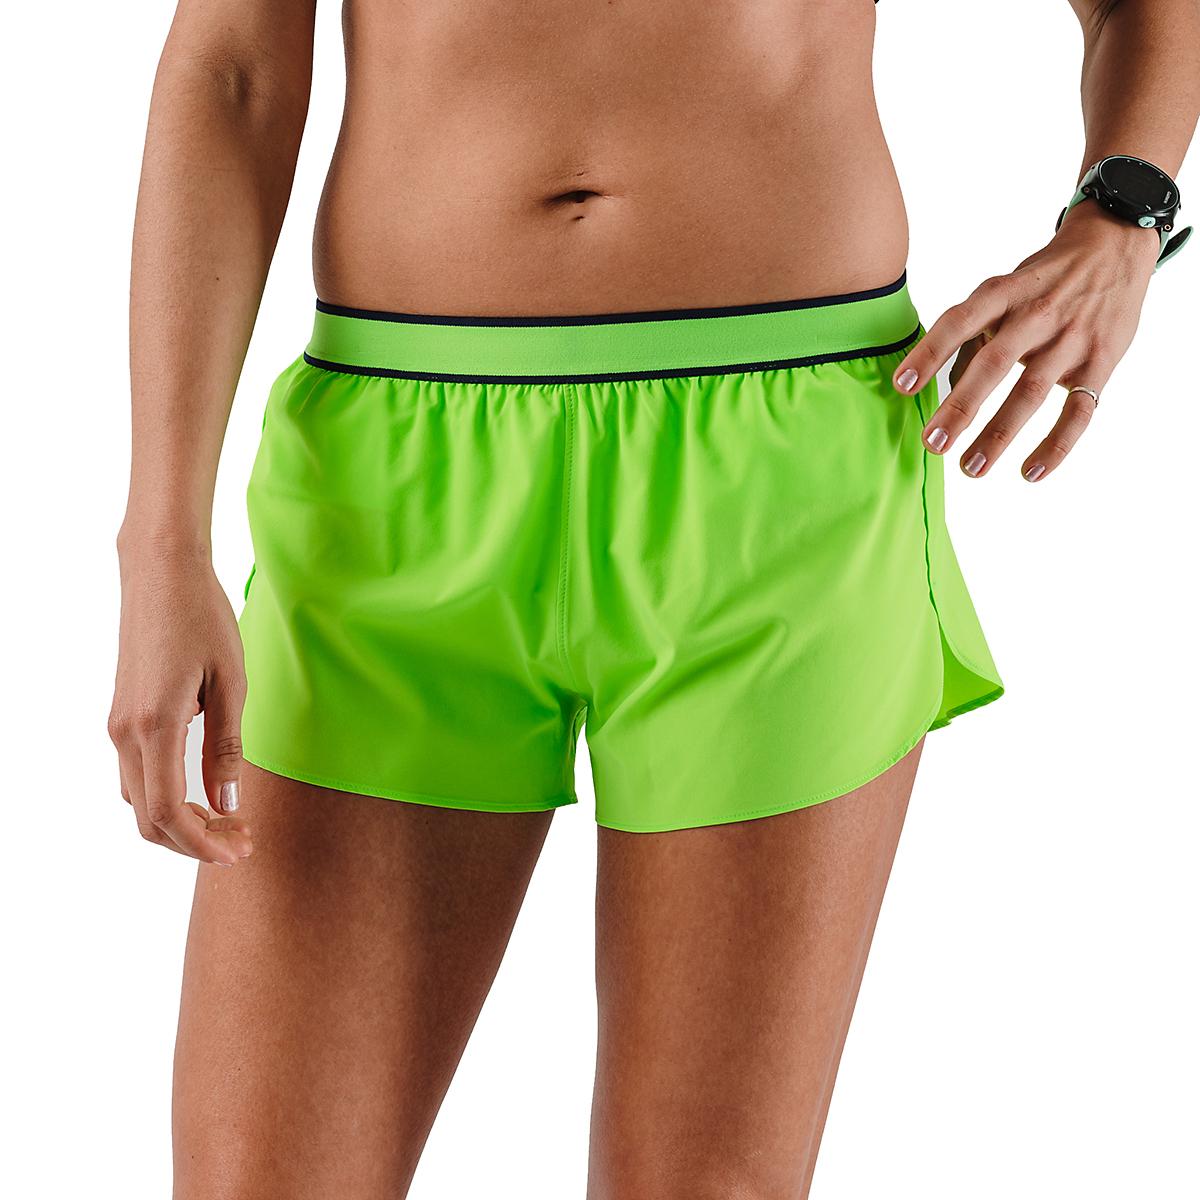 "Women's Rabbit Winner 2.0 2"" Running Shorts, , large, image 1"